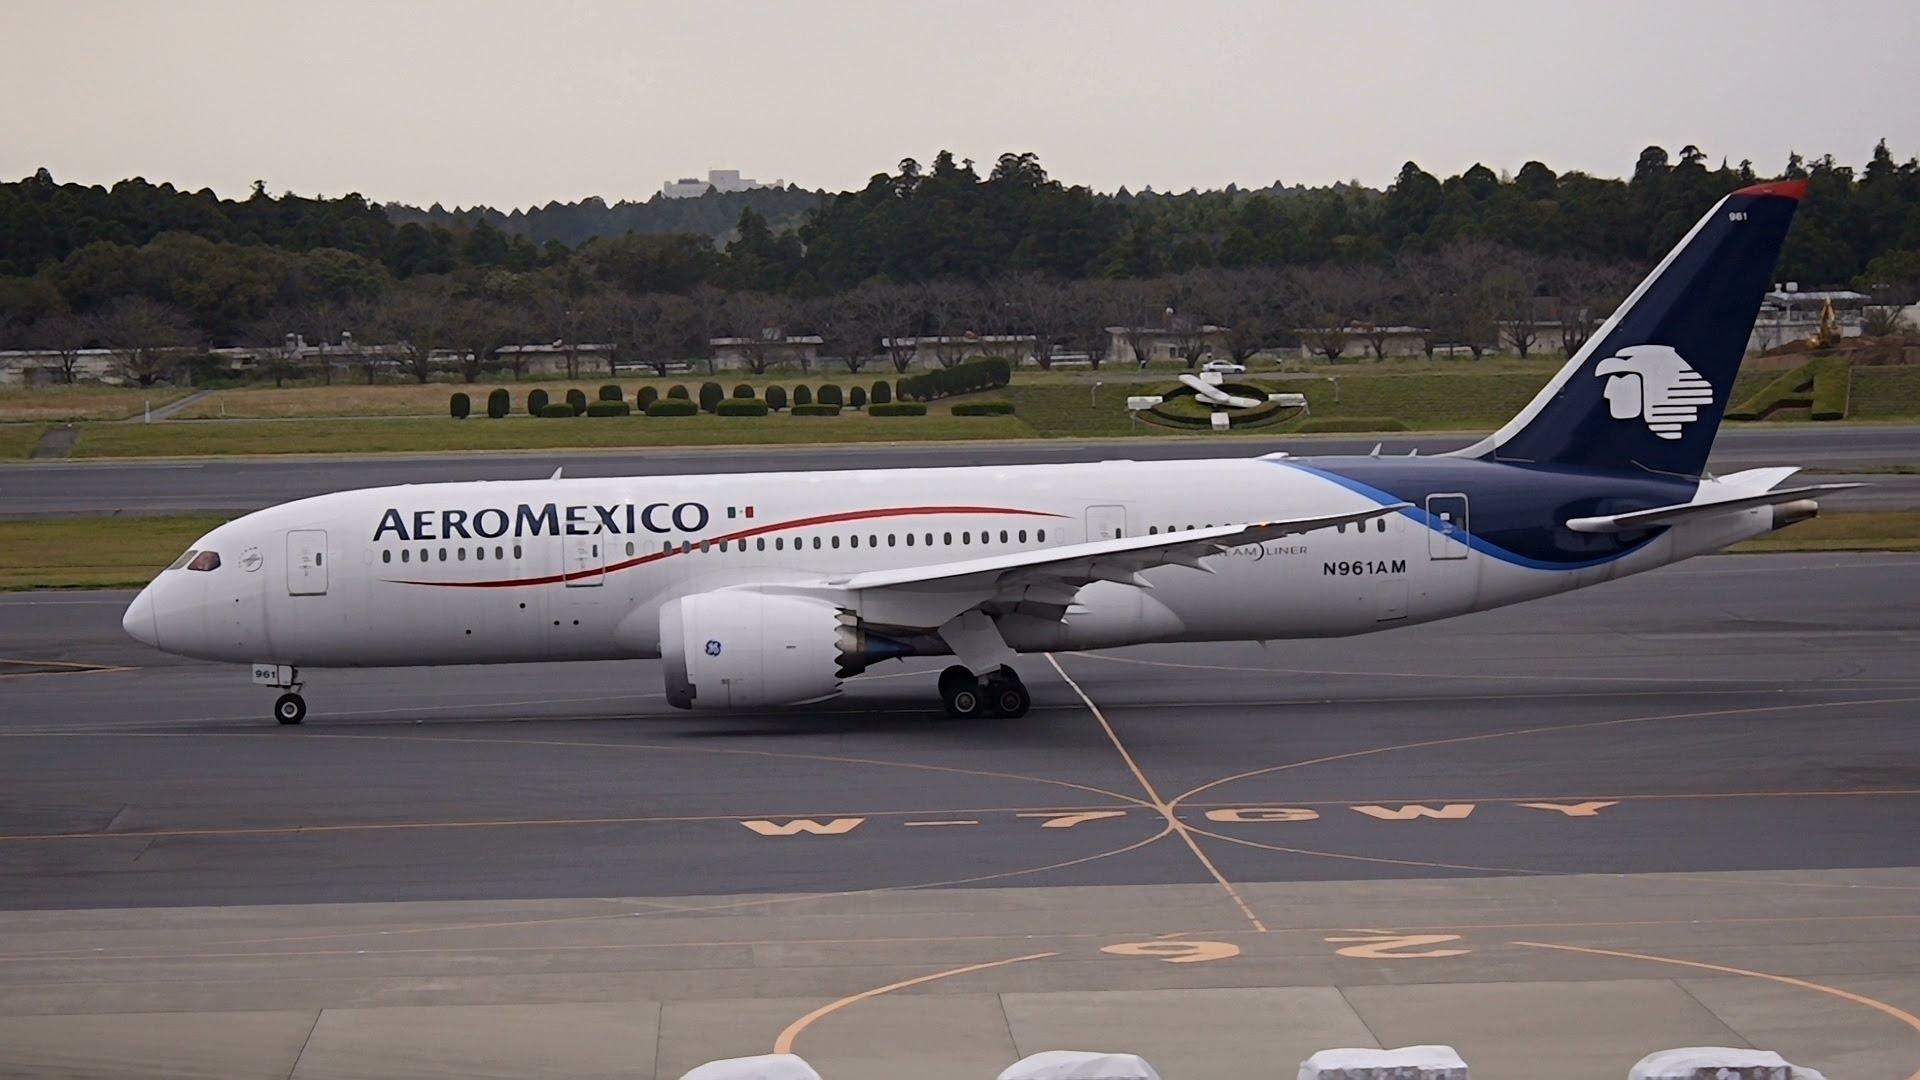 Aeromexico Boeing 787-8 N961AM [NRT/RJAA]